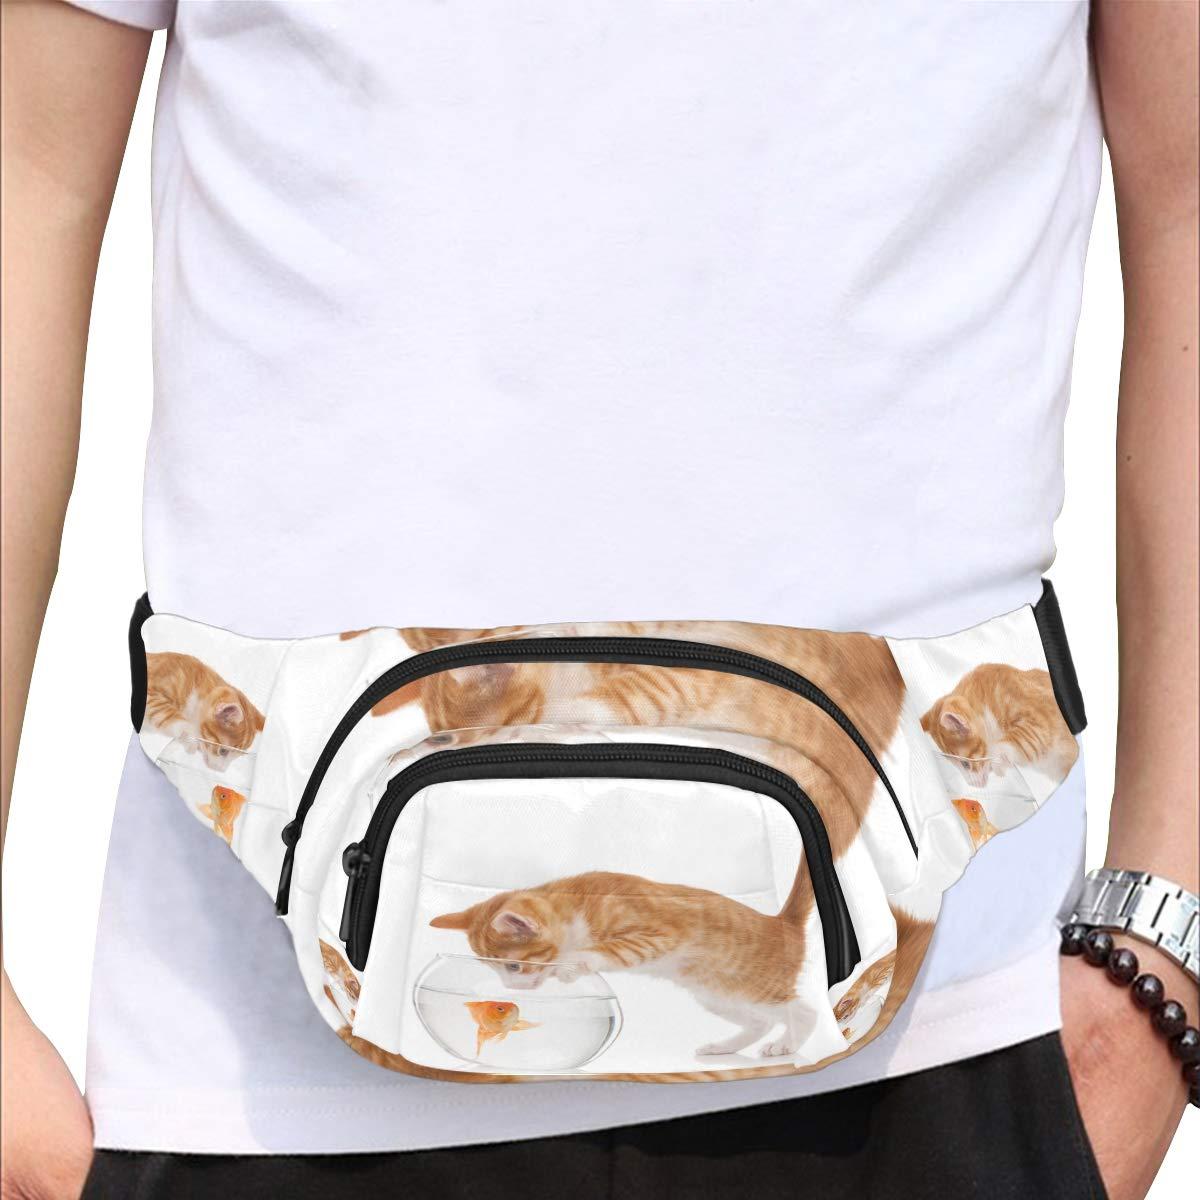 Lovely Kittens And Fish Fenny Packs Waist Bags Adjustable Belt Waterproof Nylon Travel Running Sport Vacation Party For Men Women Boys Girls Kids